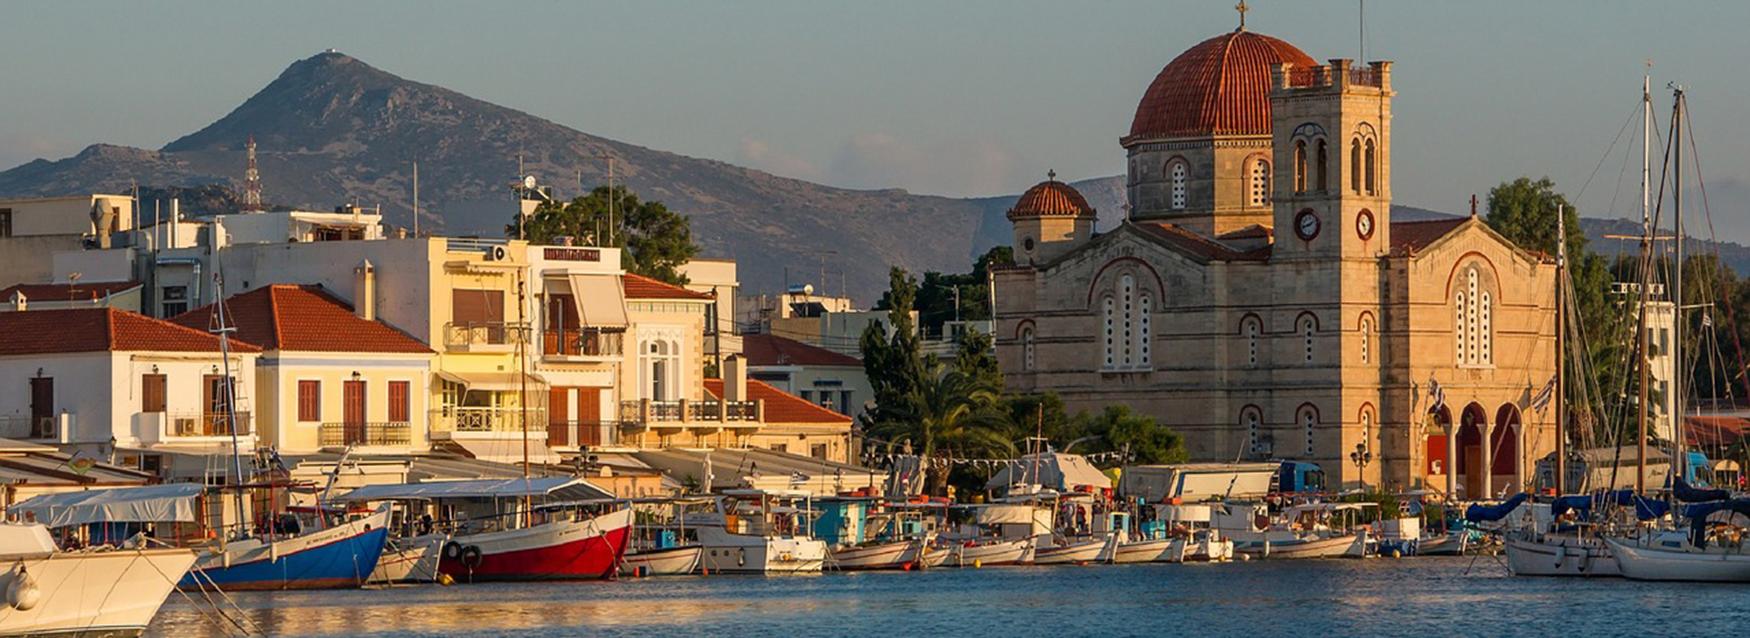 Zeilen in Griekenland, Argo Saronische eilanden